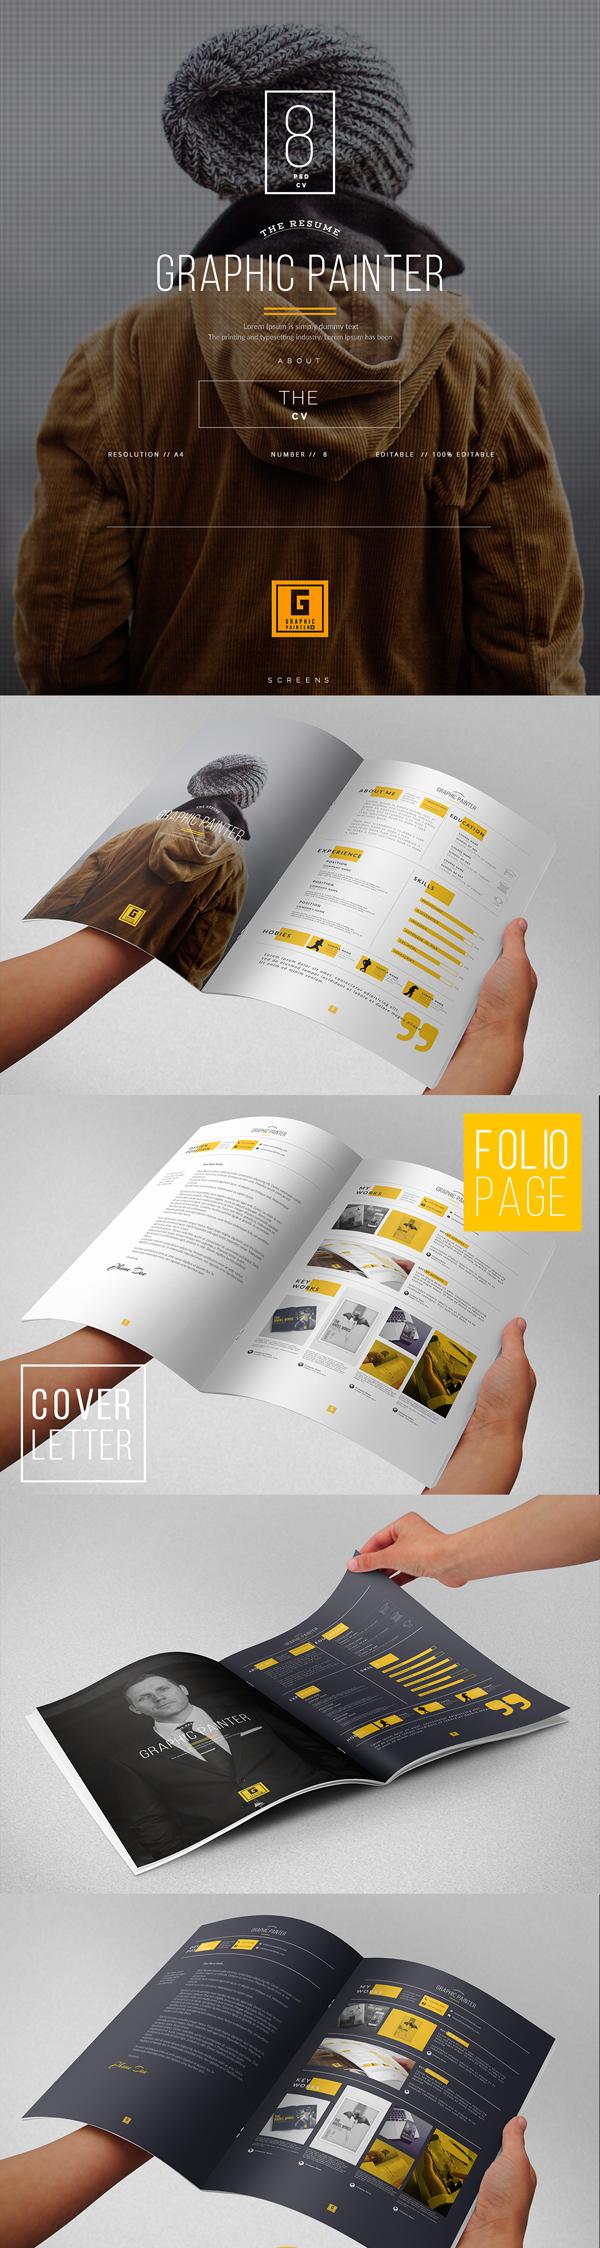 Free Creative Resume PSD Template